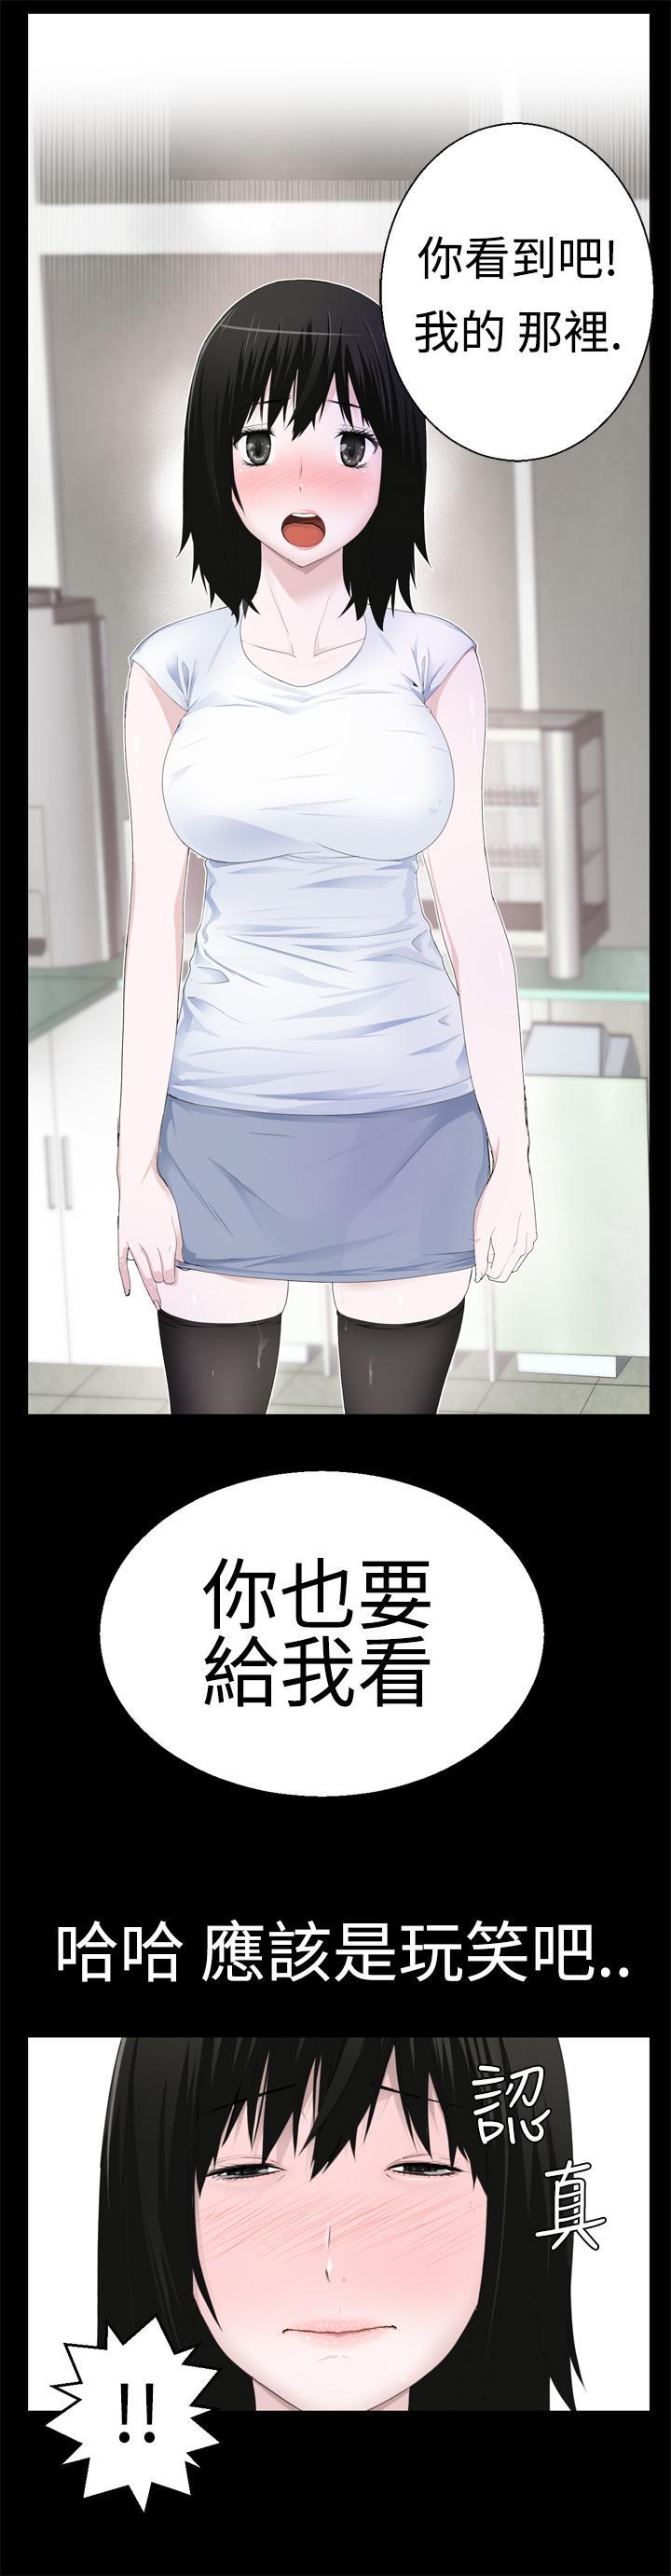 [SOSO] Franken Jo 为爱而生 法兰克赵 Ch.1~19 [Chinese]中文 192